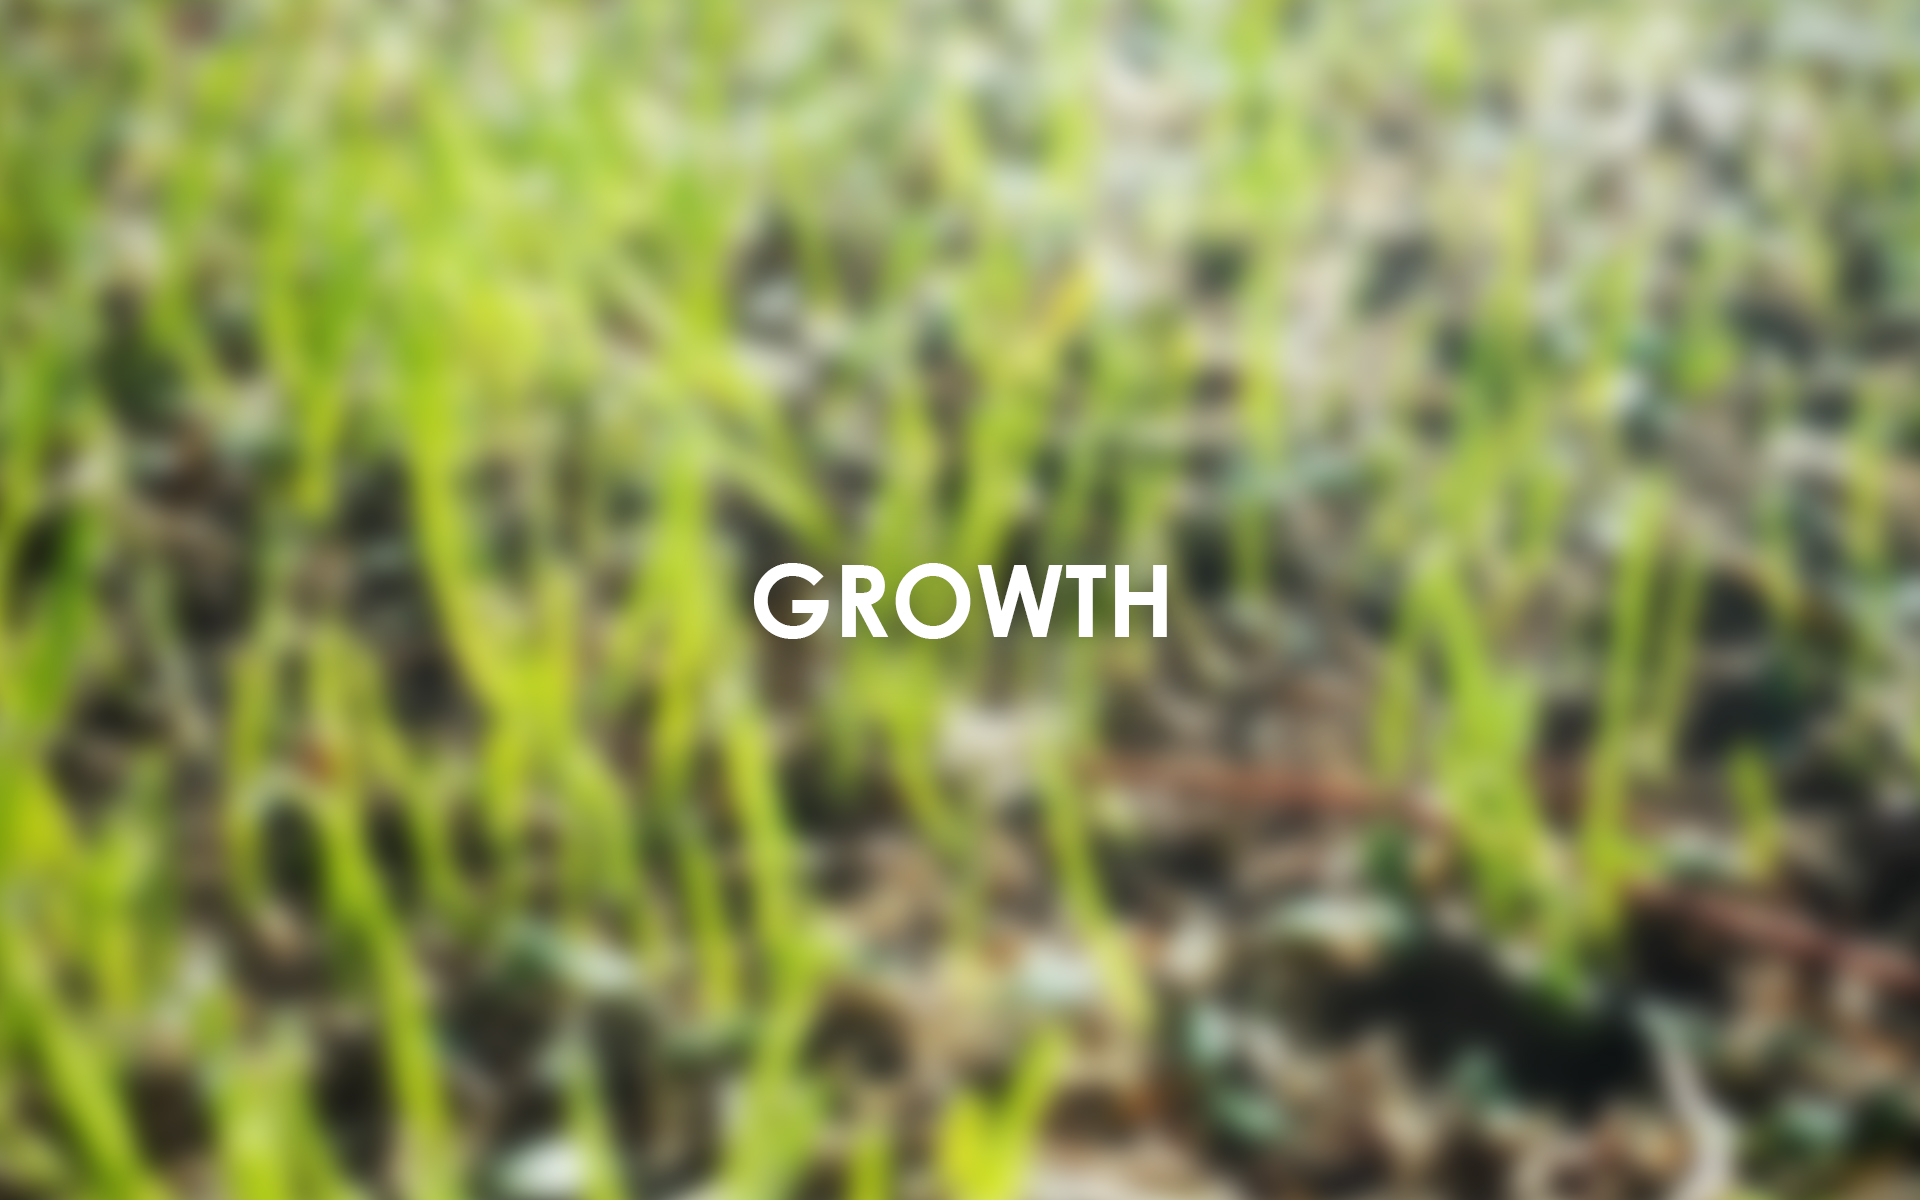 ABC Wallpaper growth